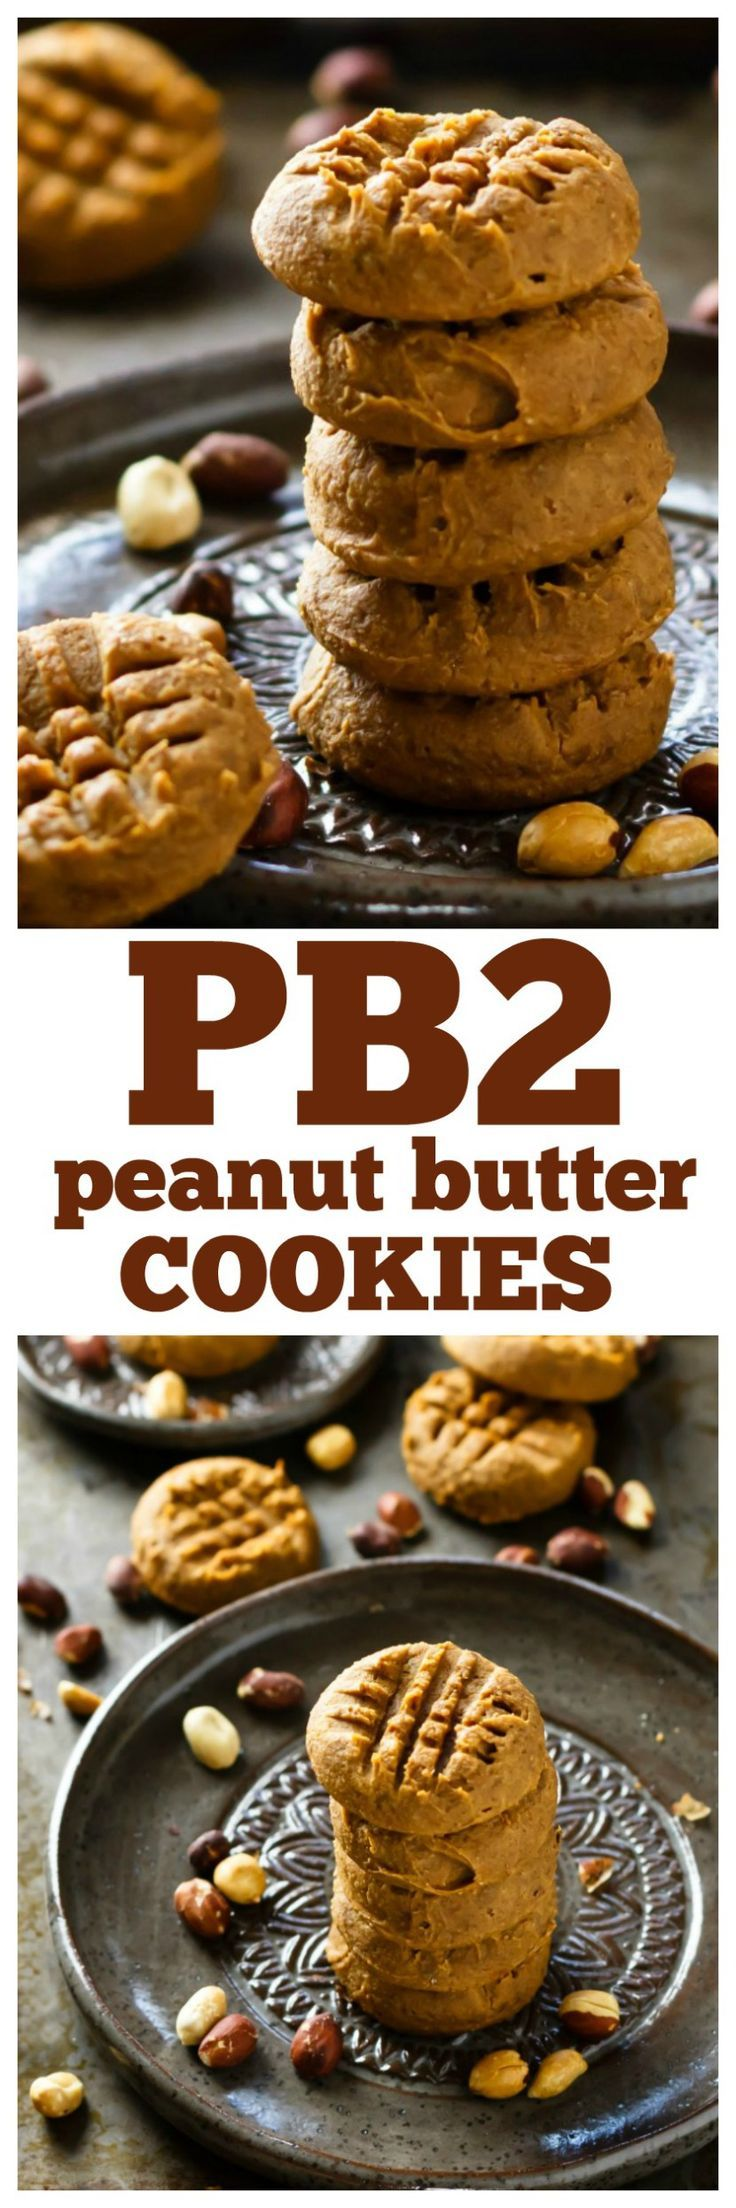 how to make peanut sauce with pb2